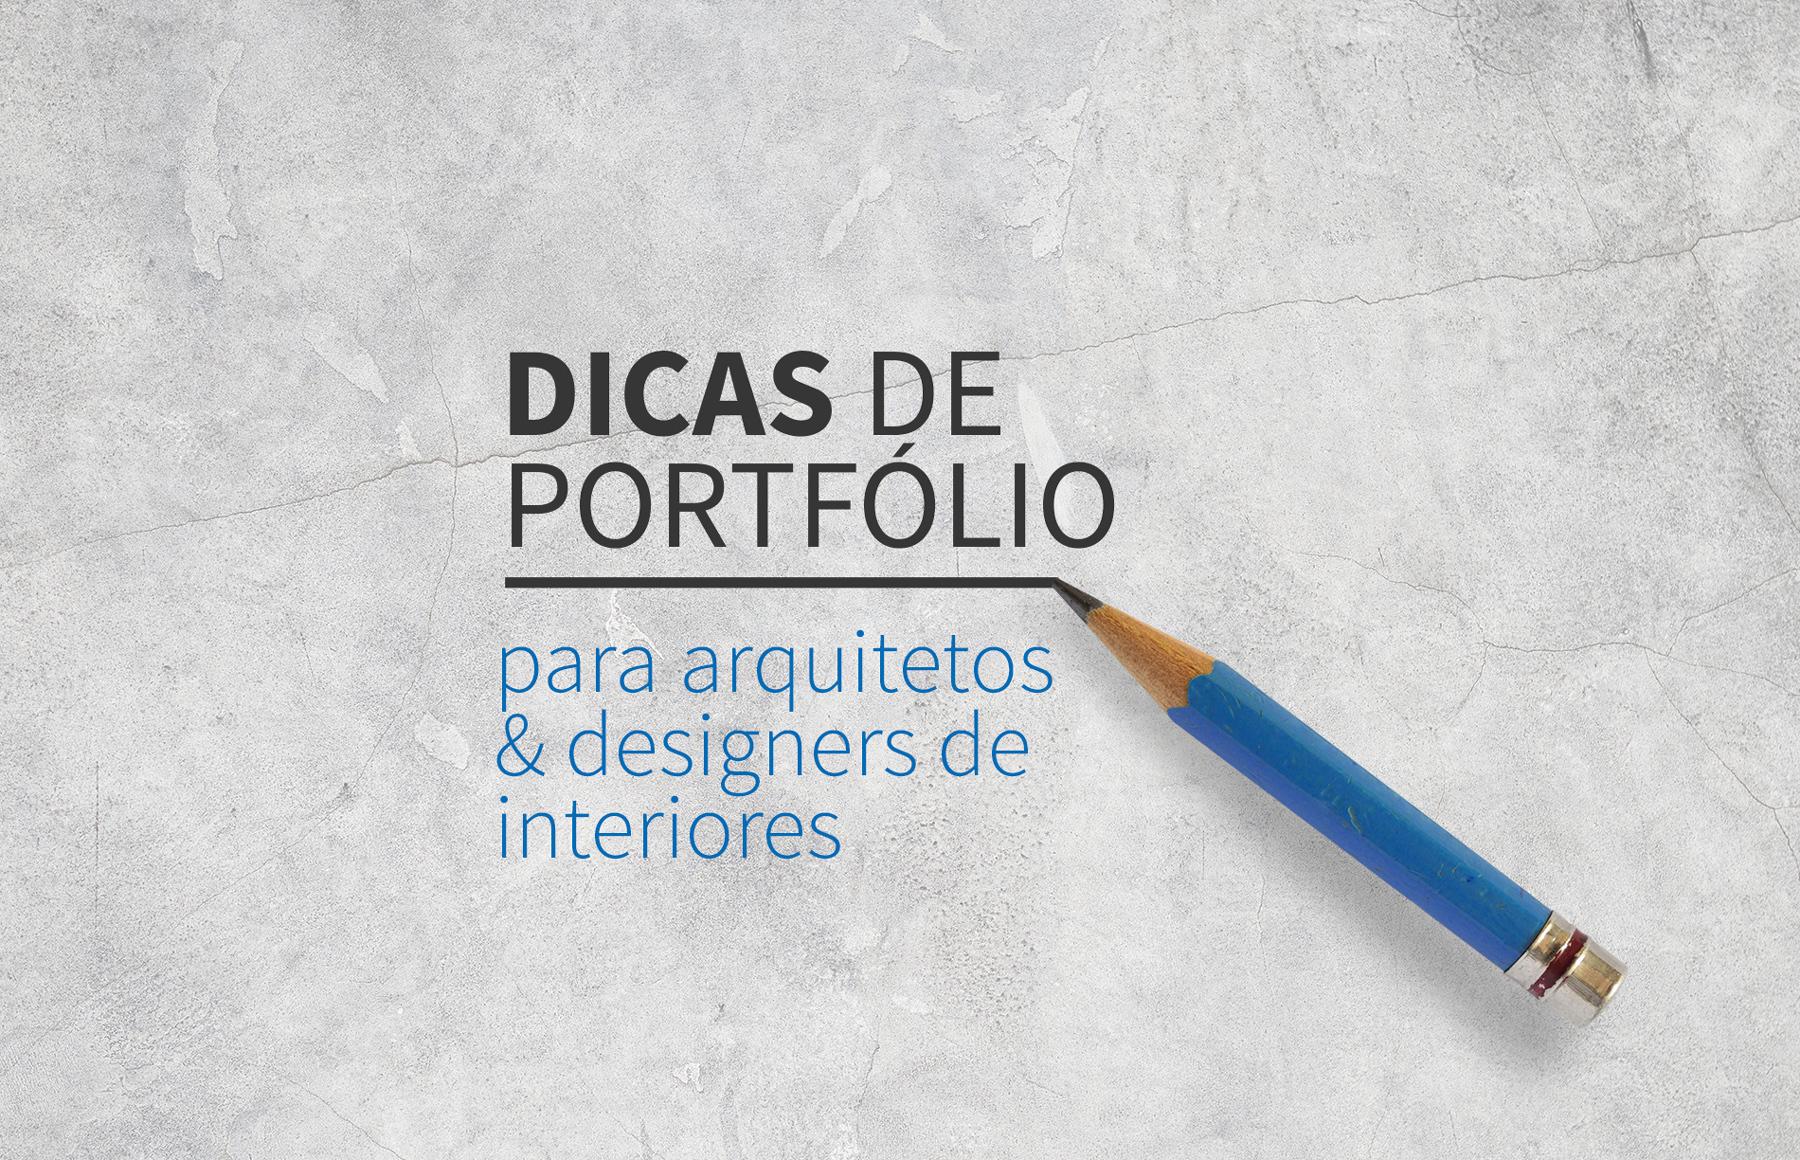 Interior Design Projects in Progress